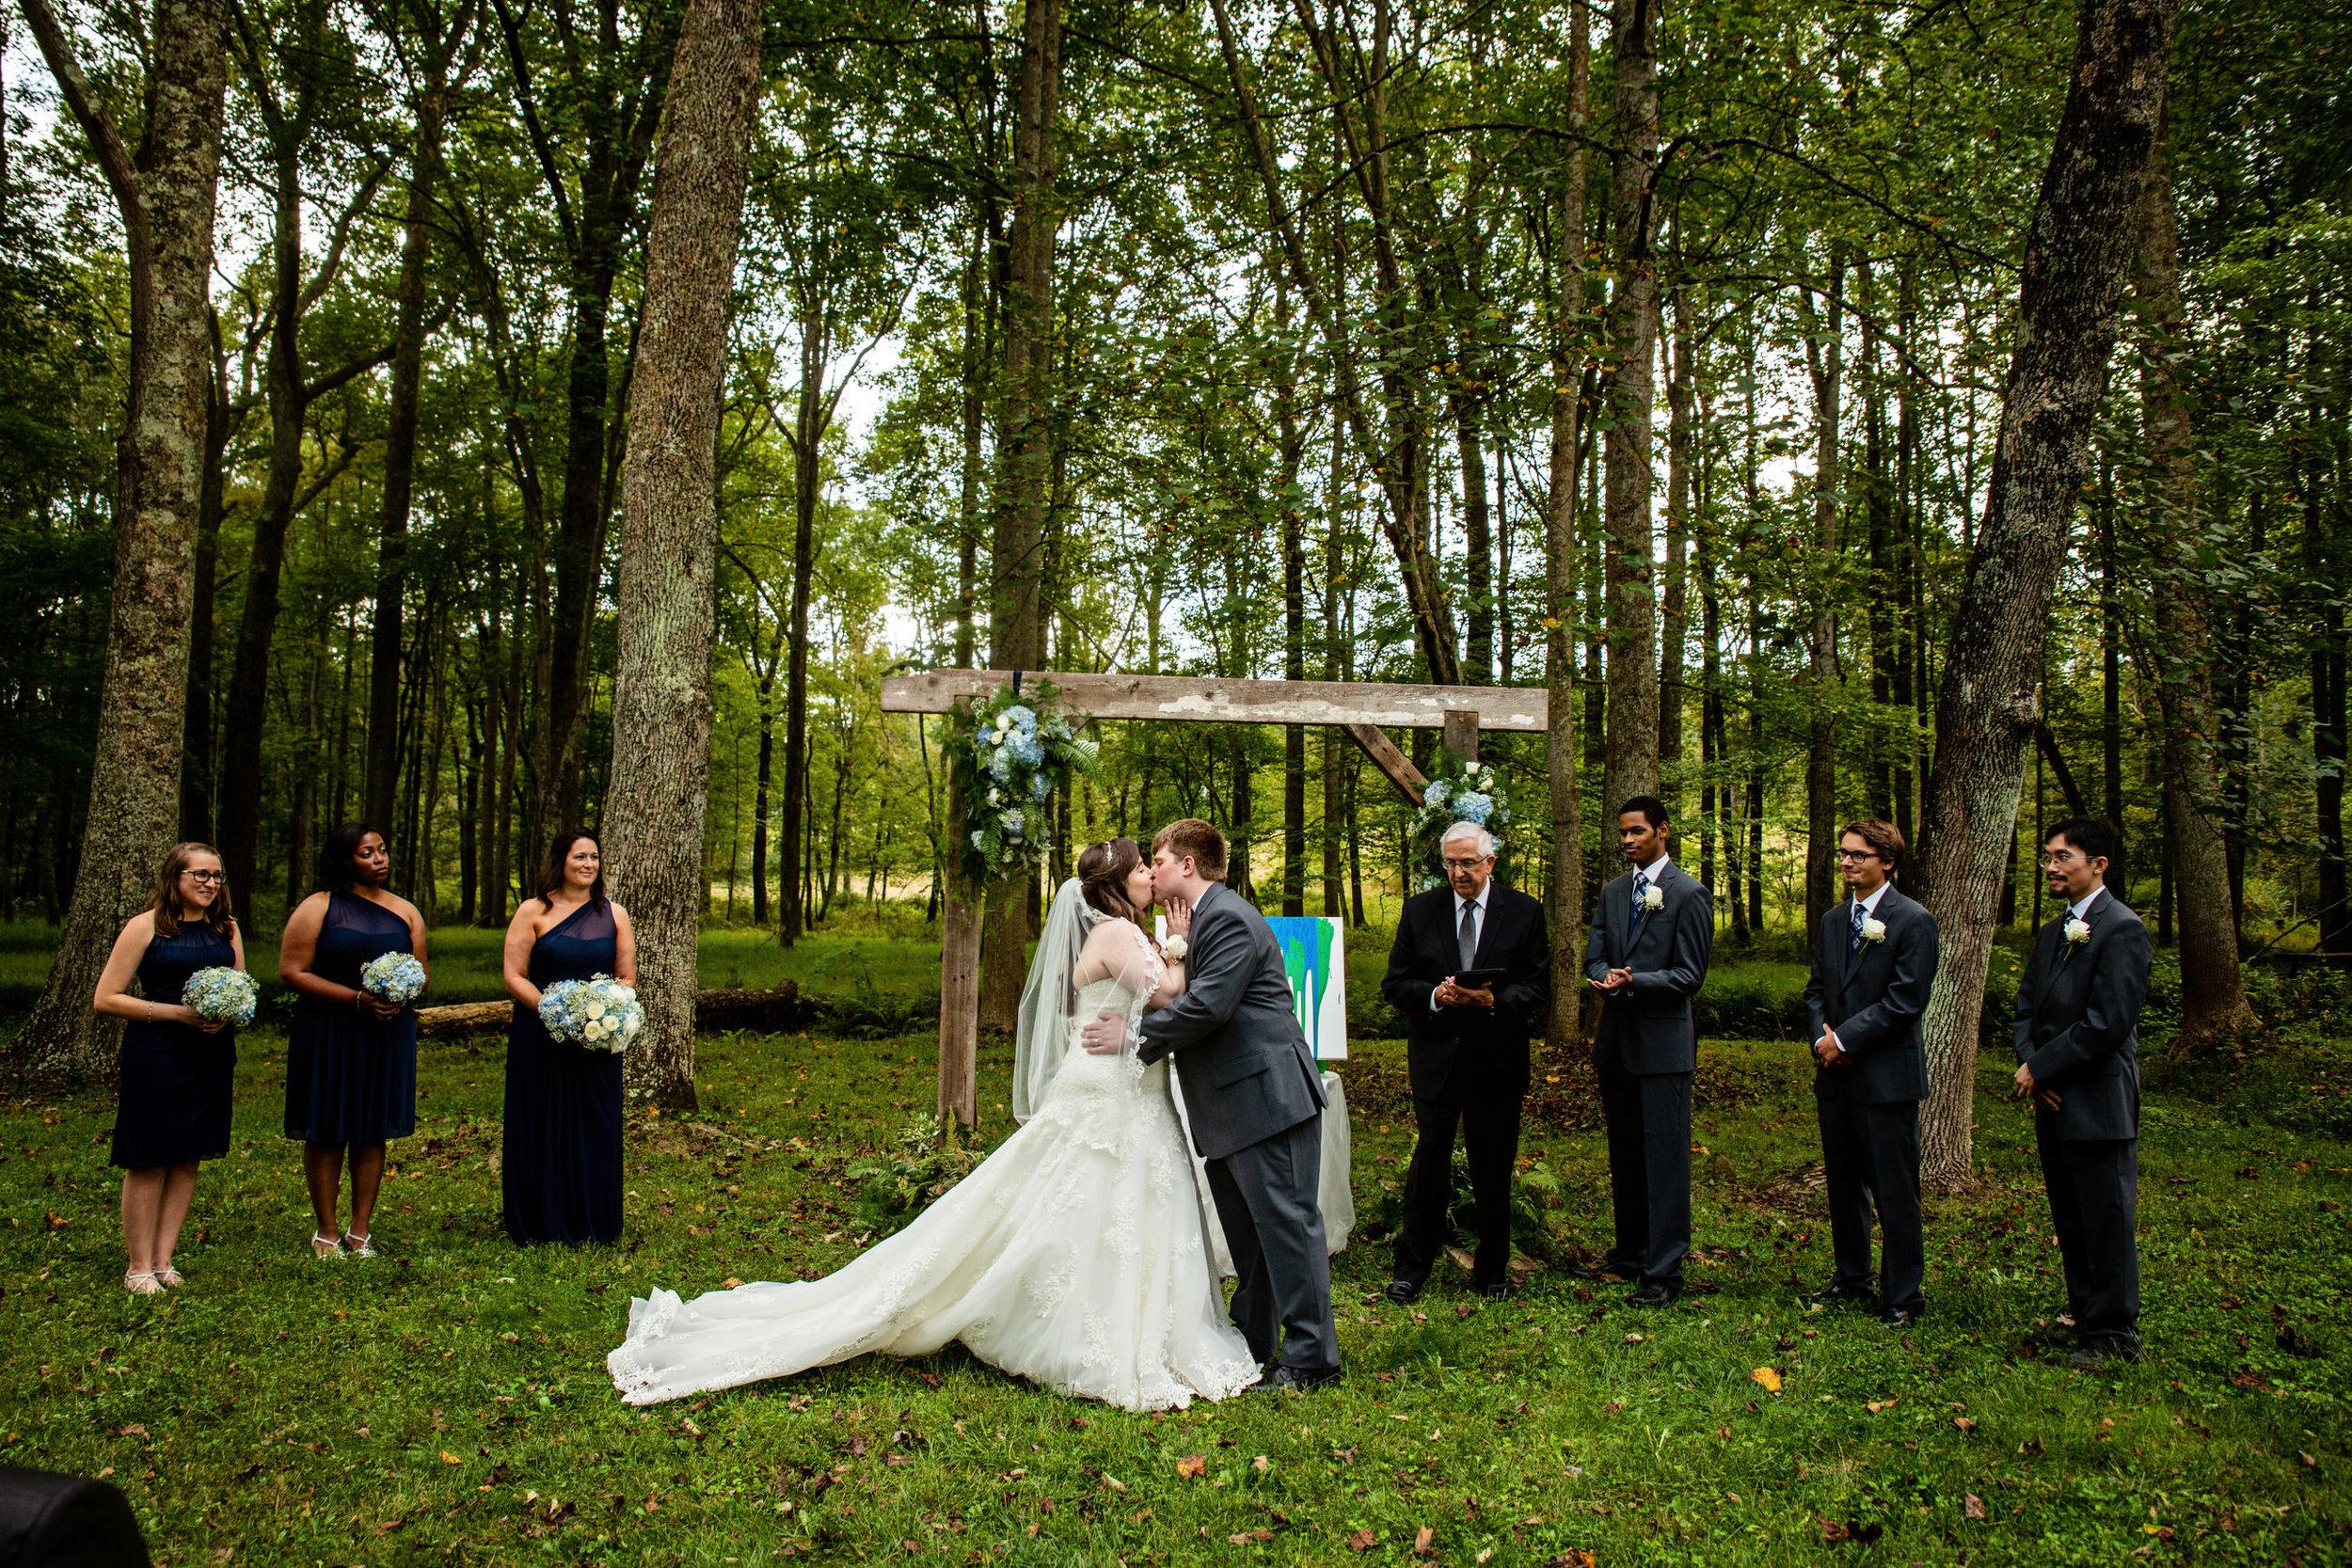 OstertaagVista-Caitlin&Brandon-Ceremony-11.jpg